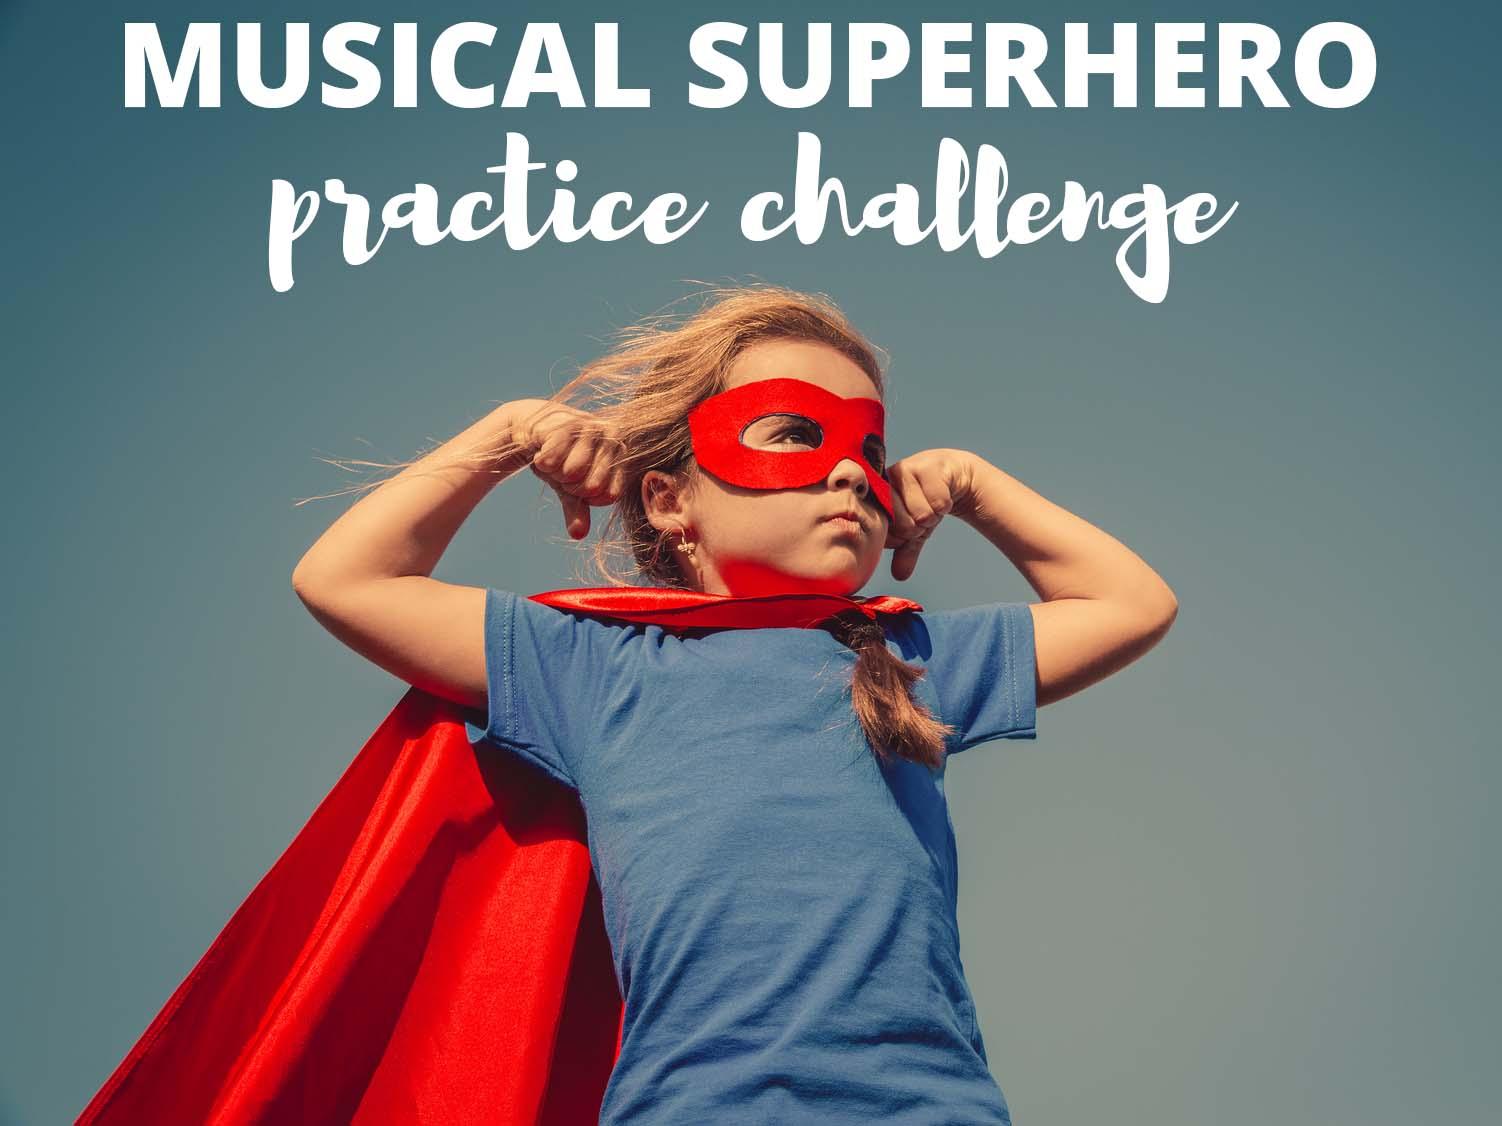 Become A Musical Superhero